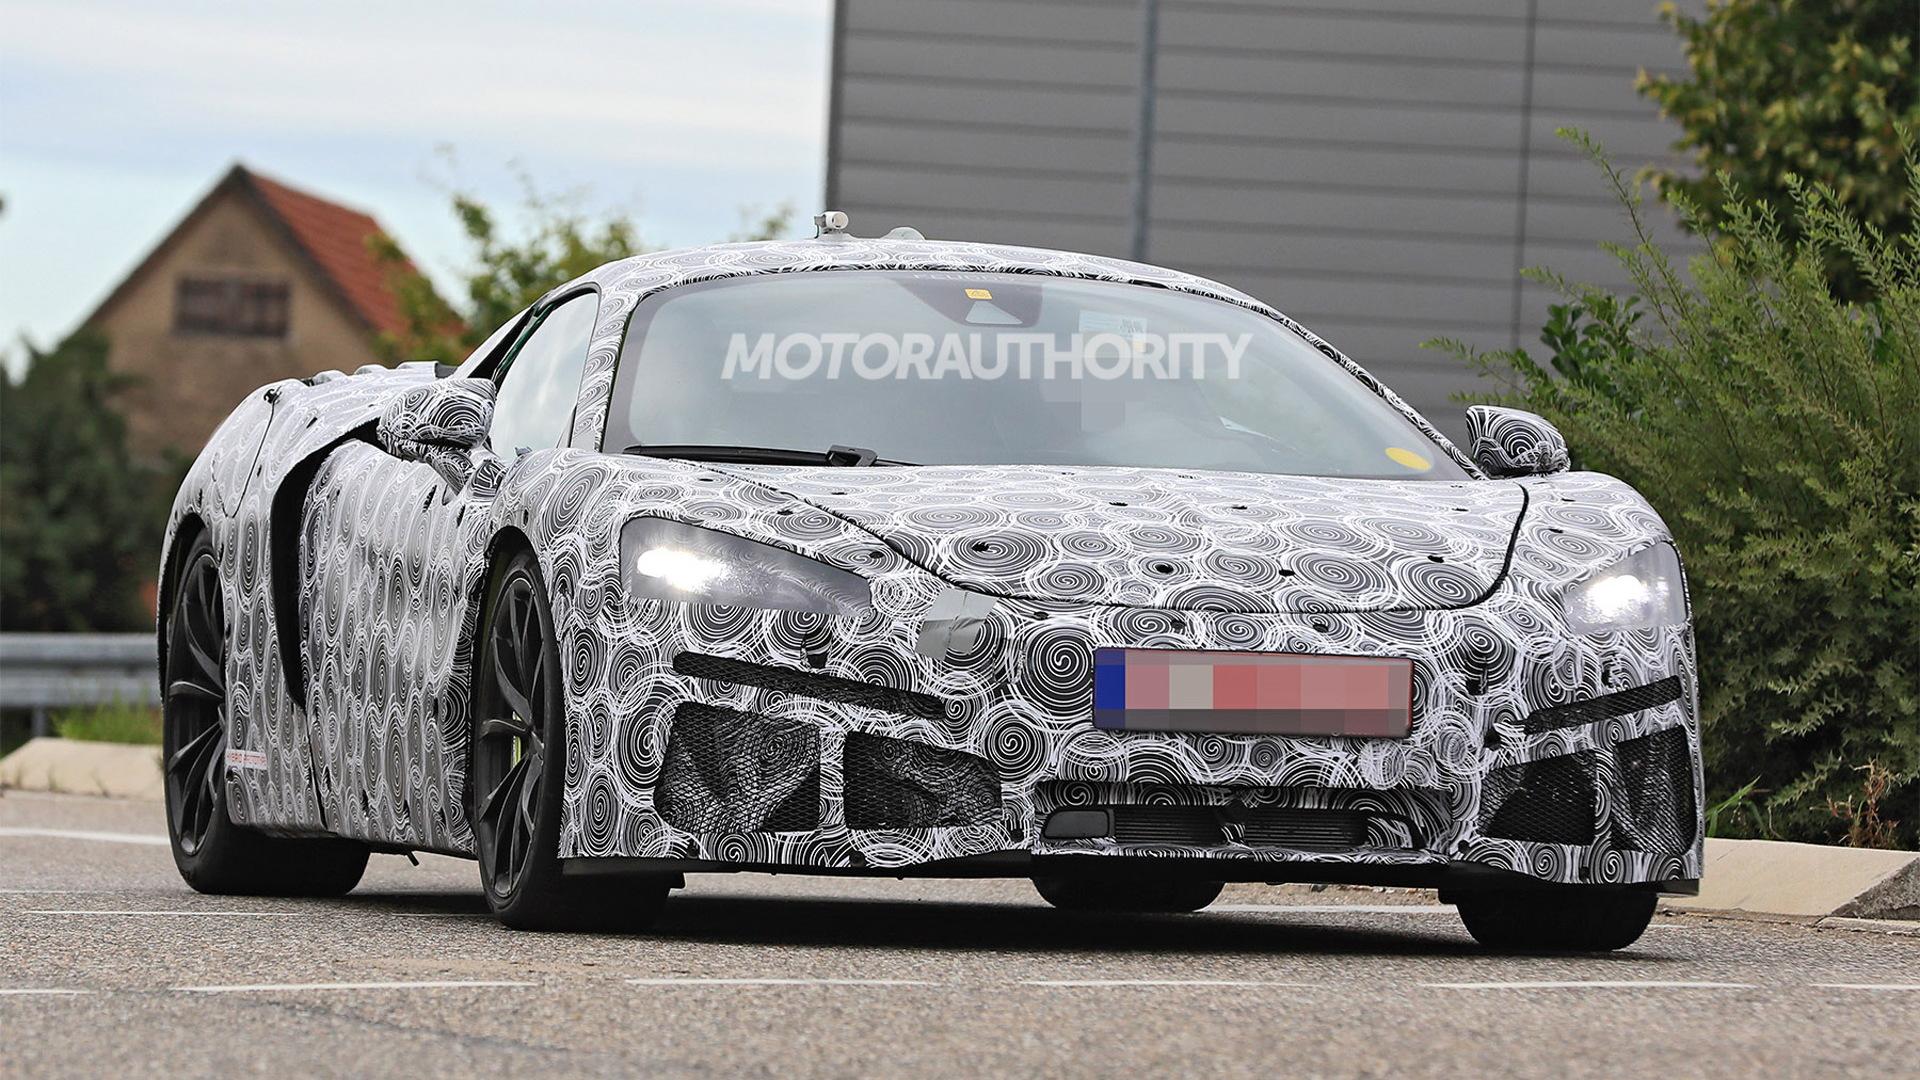 McLaren Artura spy shots - Photo credit: S. Baldauf/SB-Medien